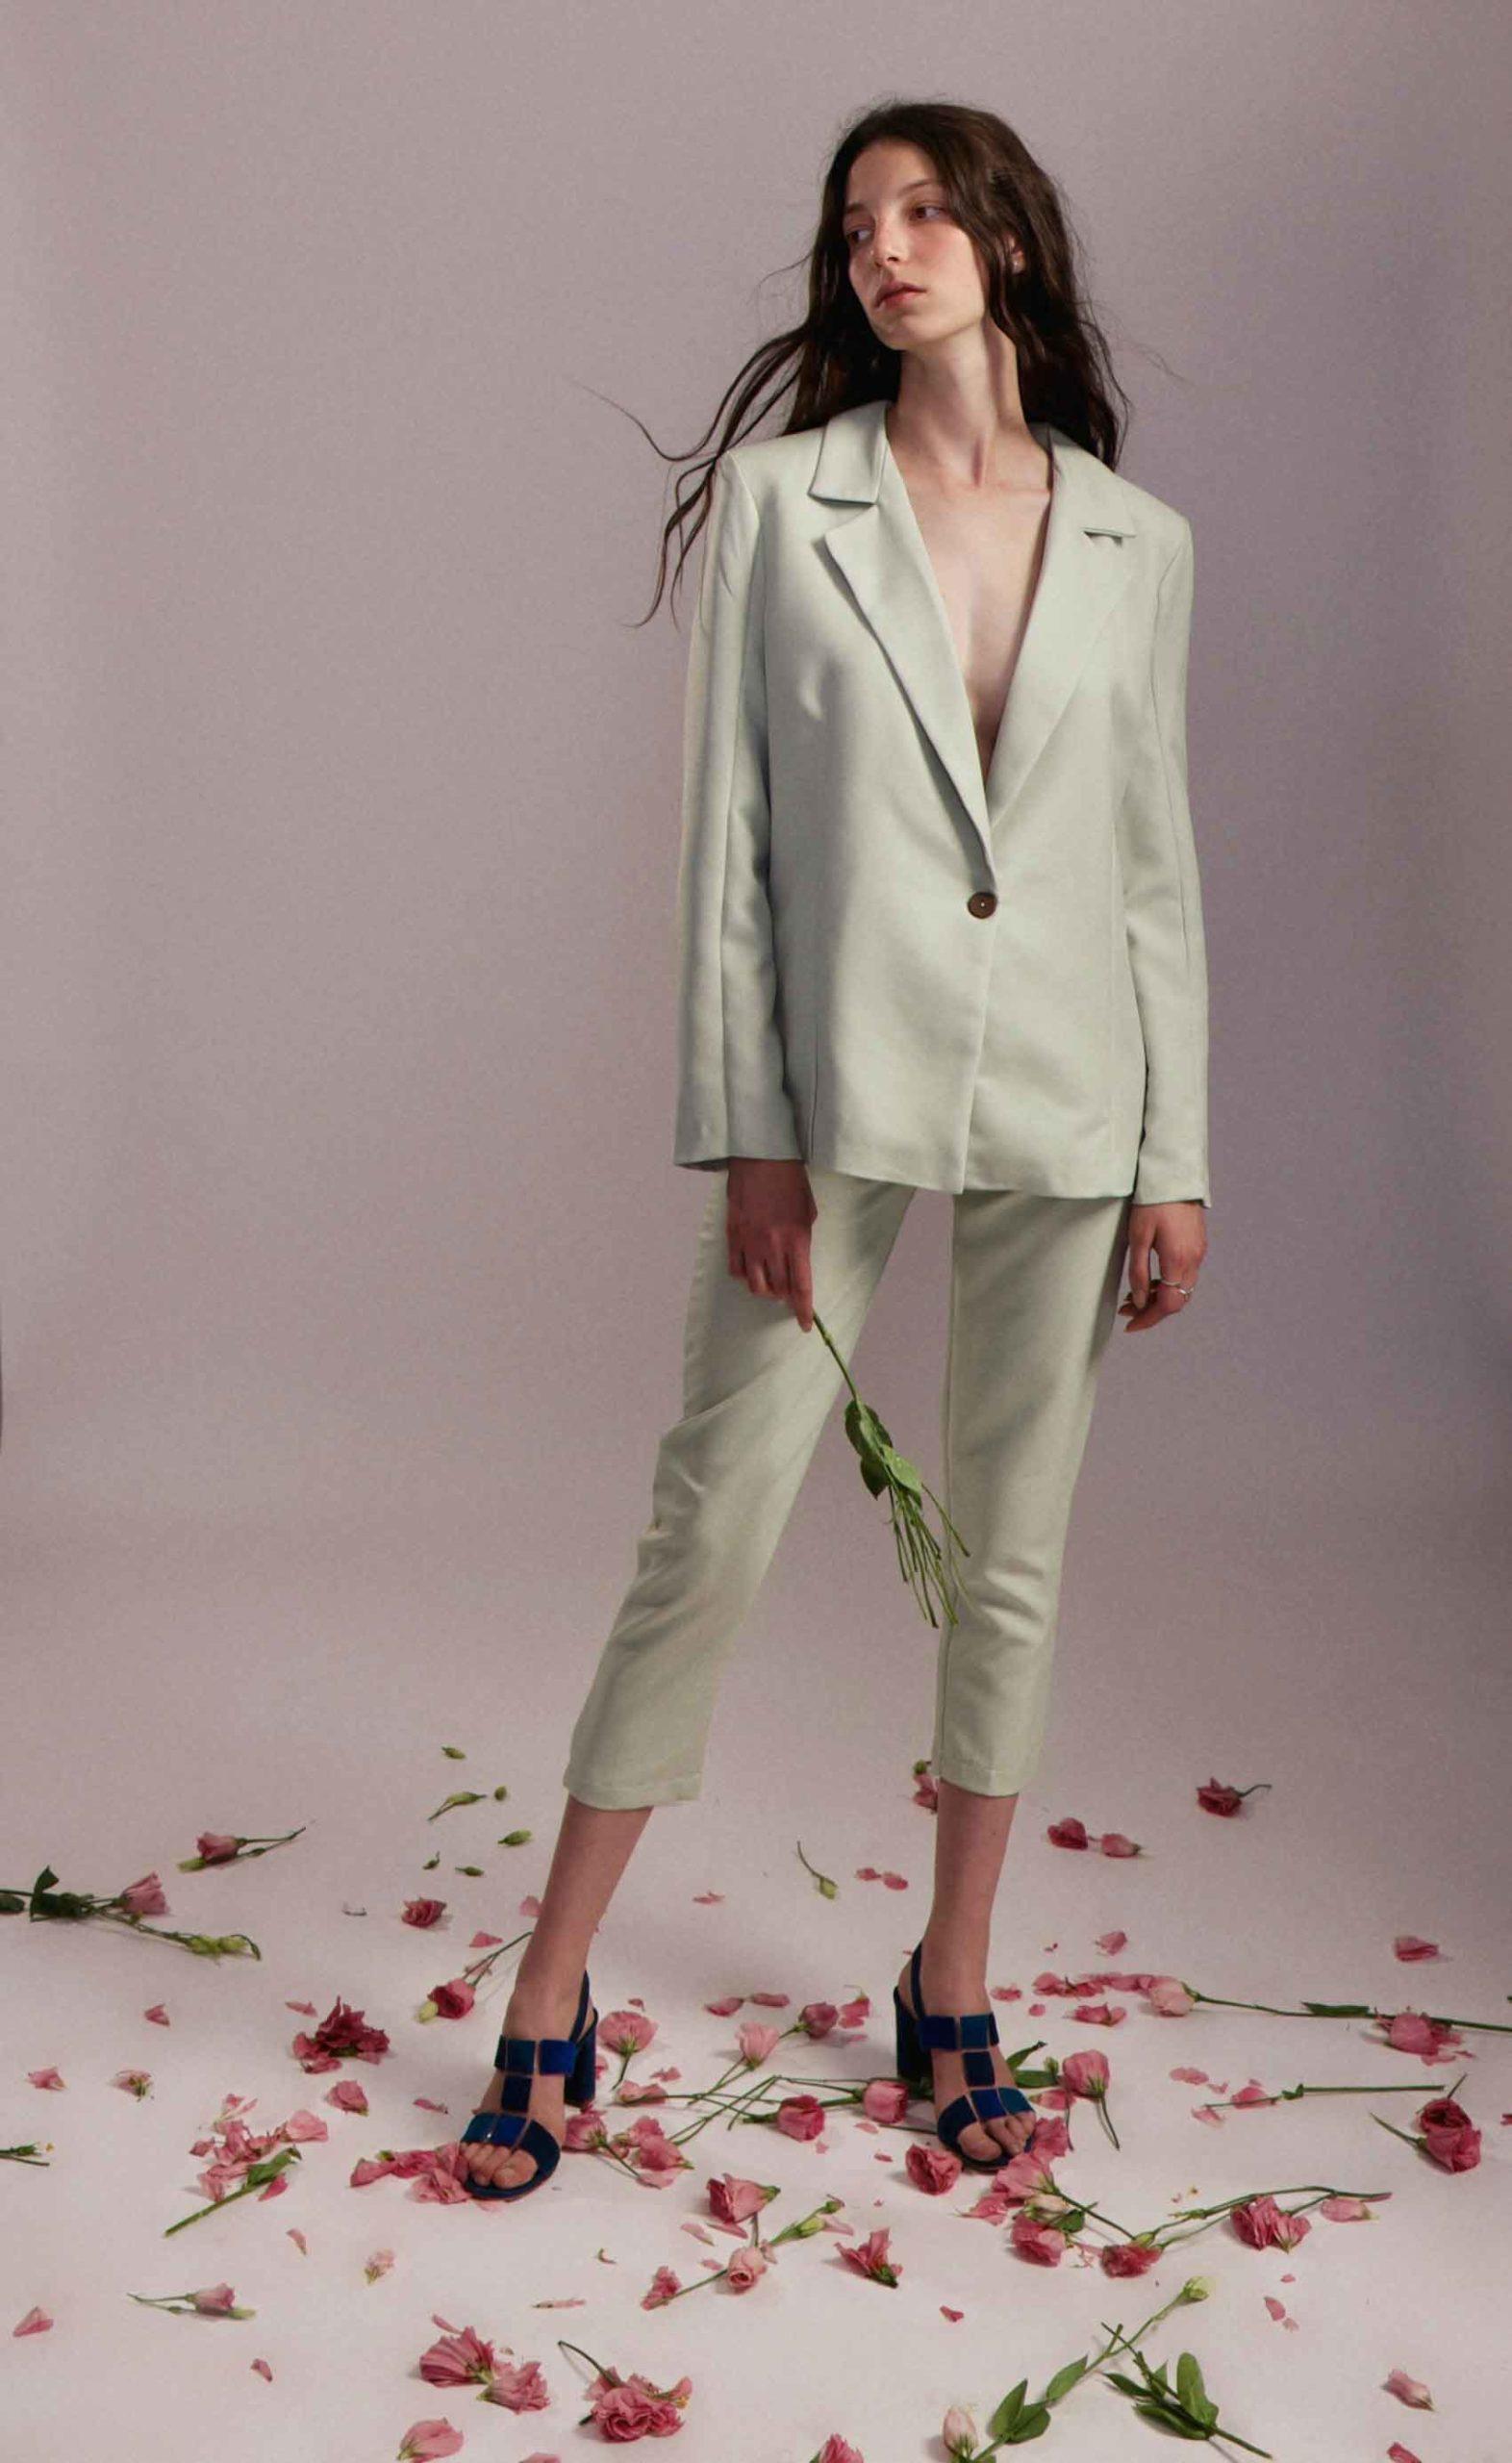 Photographer- Oz Shemesh, Styling - Maor Rabin, Hair - Maor kidushim Agency - yuligroup - Fashion Israel - מגזין אופנה ישראלי-17